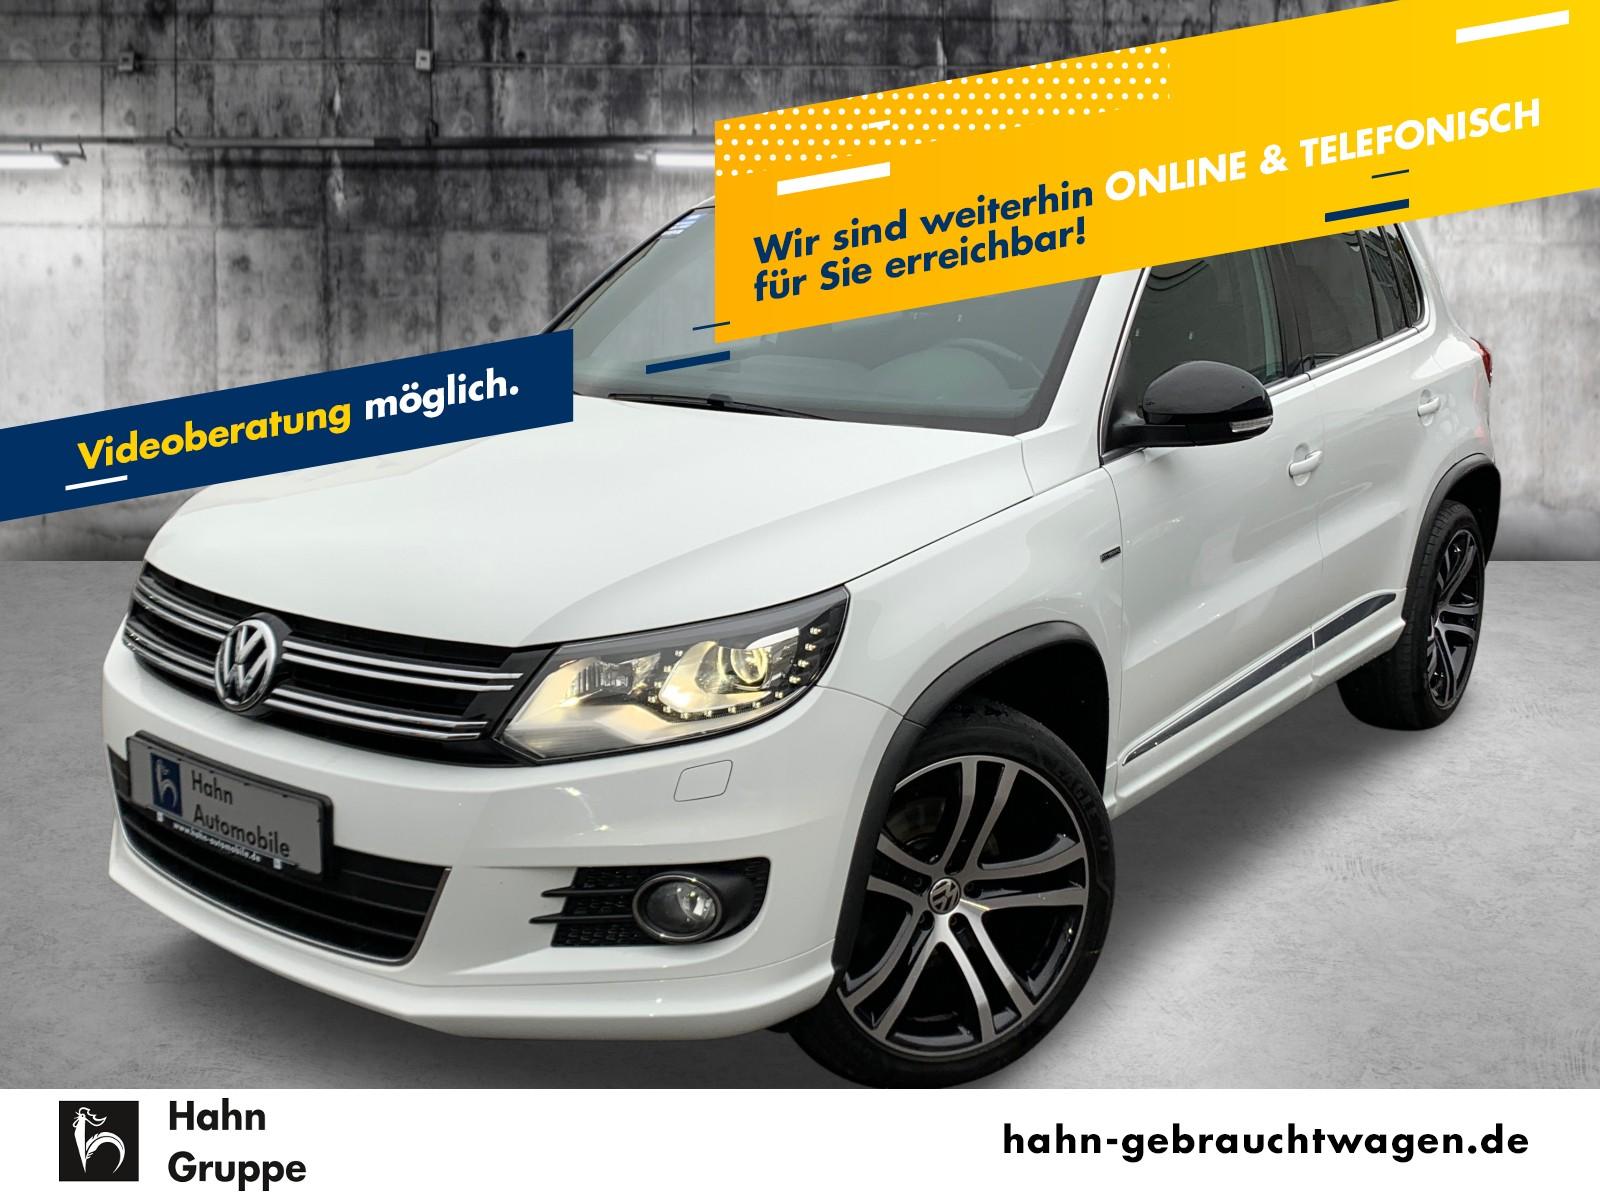 Volkswagen Tiguan CityScape 4M 2,0TDI DSG Navi Pano Xen AHK, Jahr 2015, Diesel